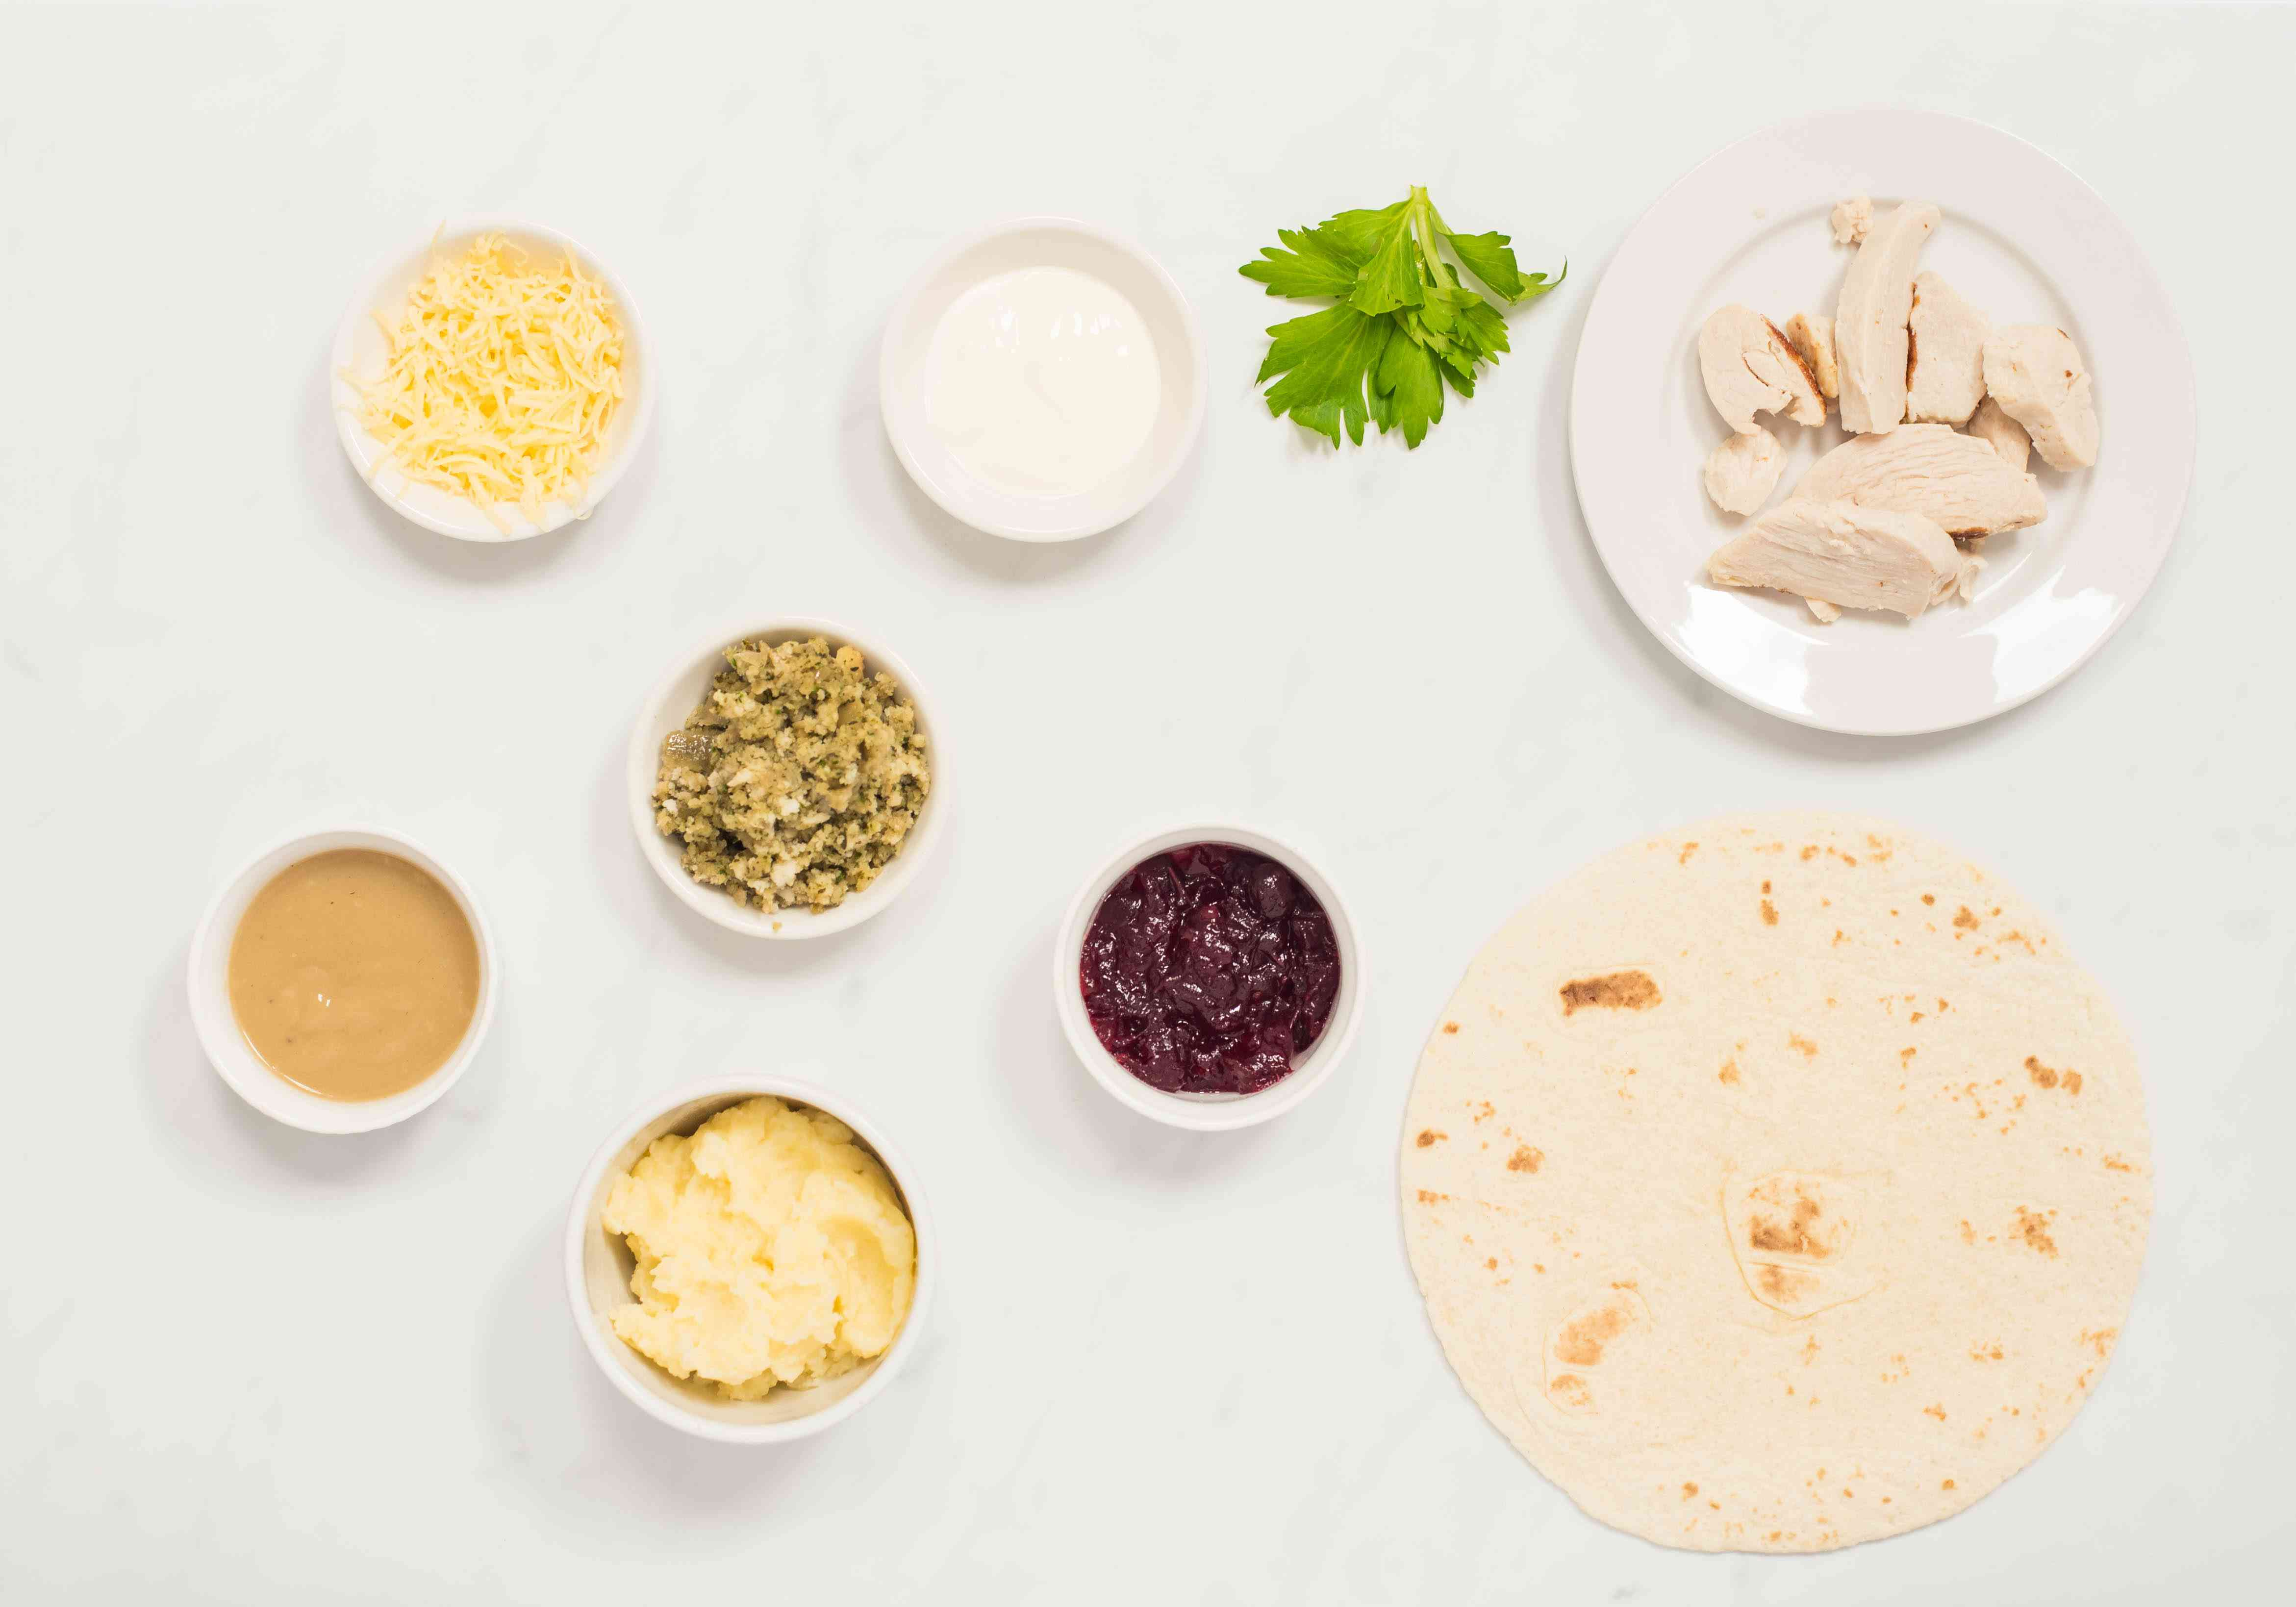 Ingredients for leftovers burrito